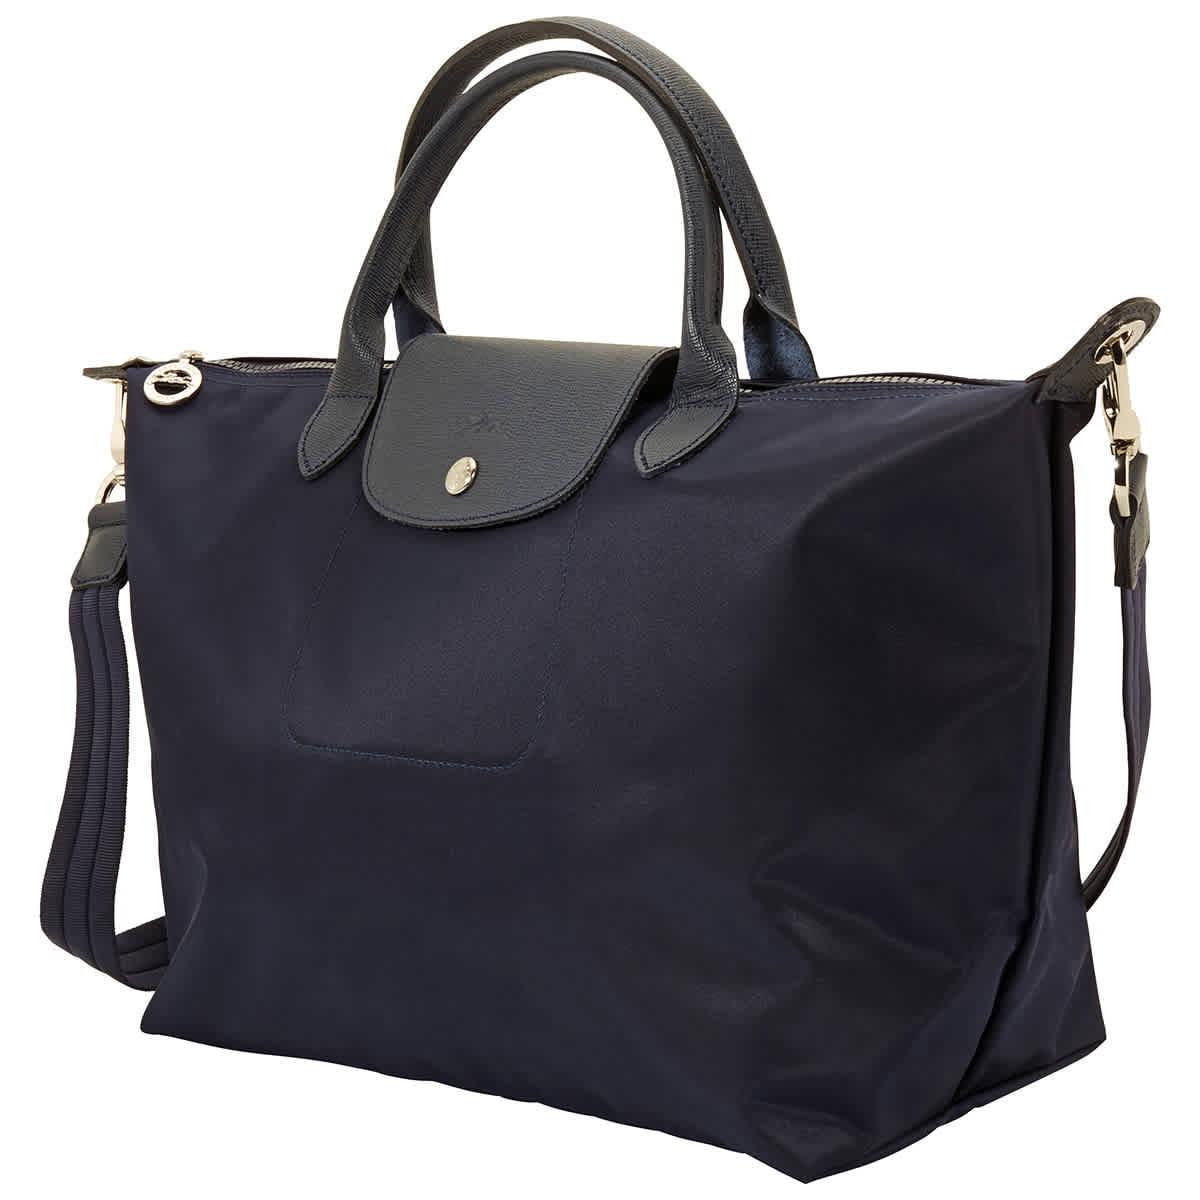 Longchamp Ladies Le Pliage Neo Medium Tote Bag - Walmart.com